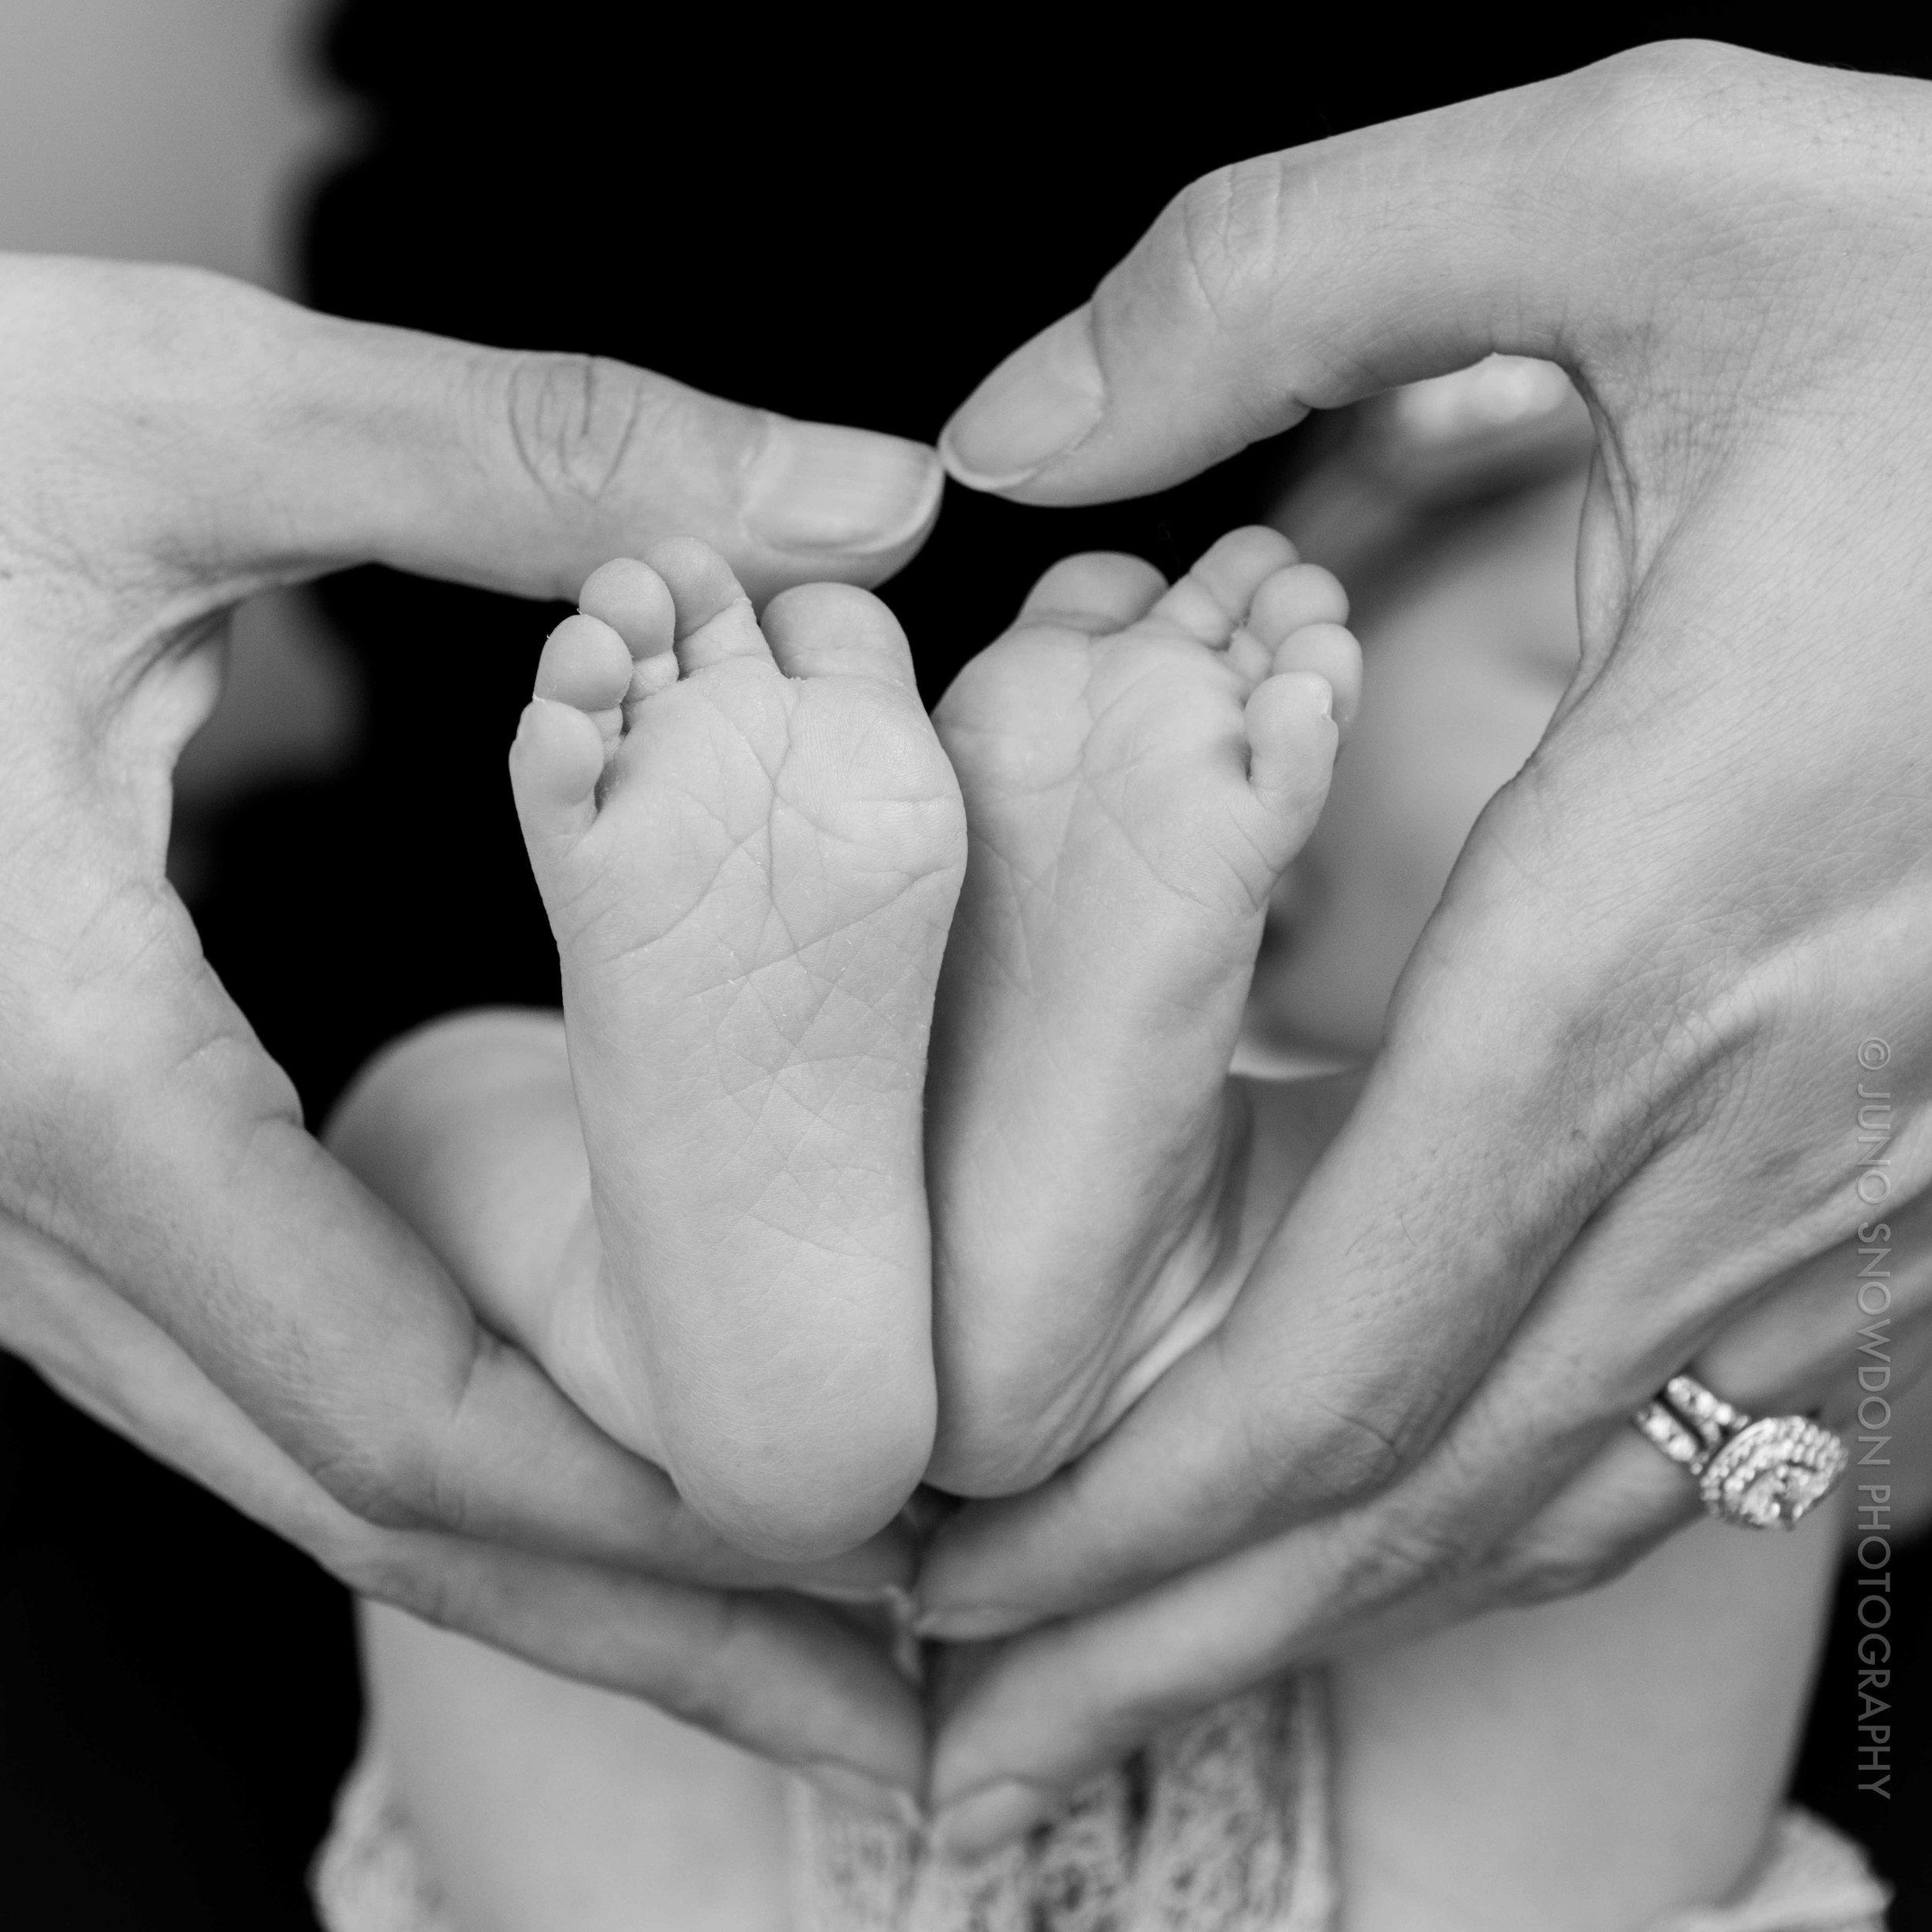 juno-snowdon-photography-newborn-7252.jpg